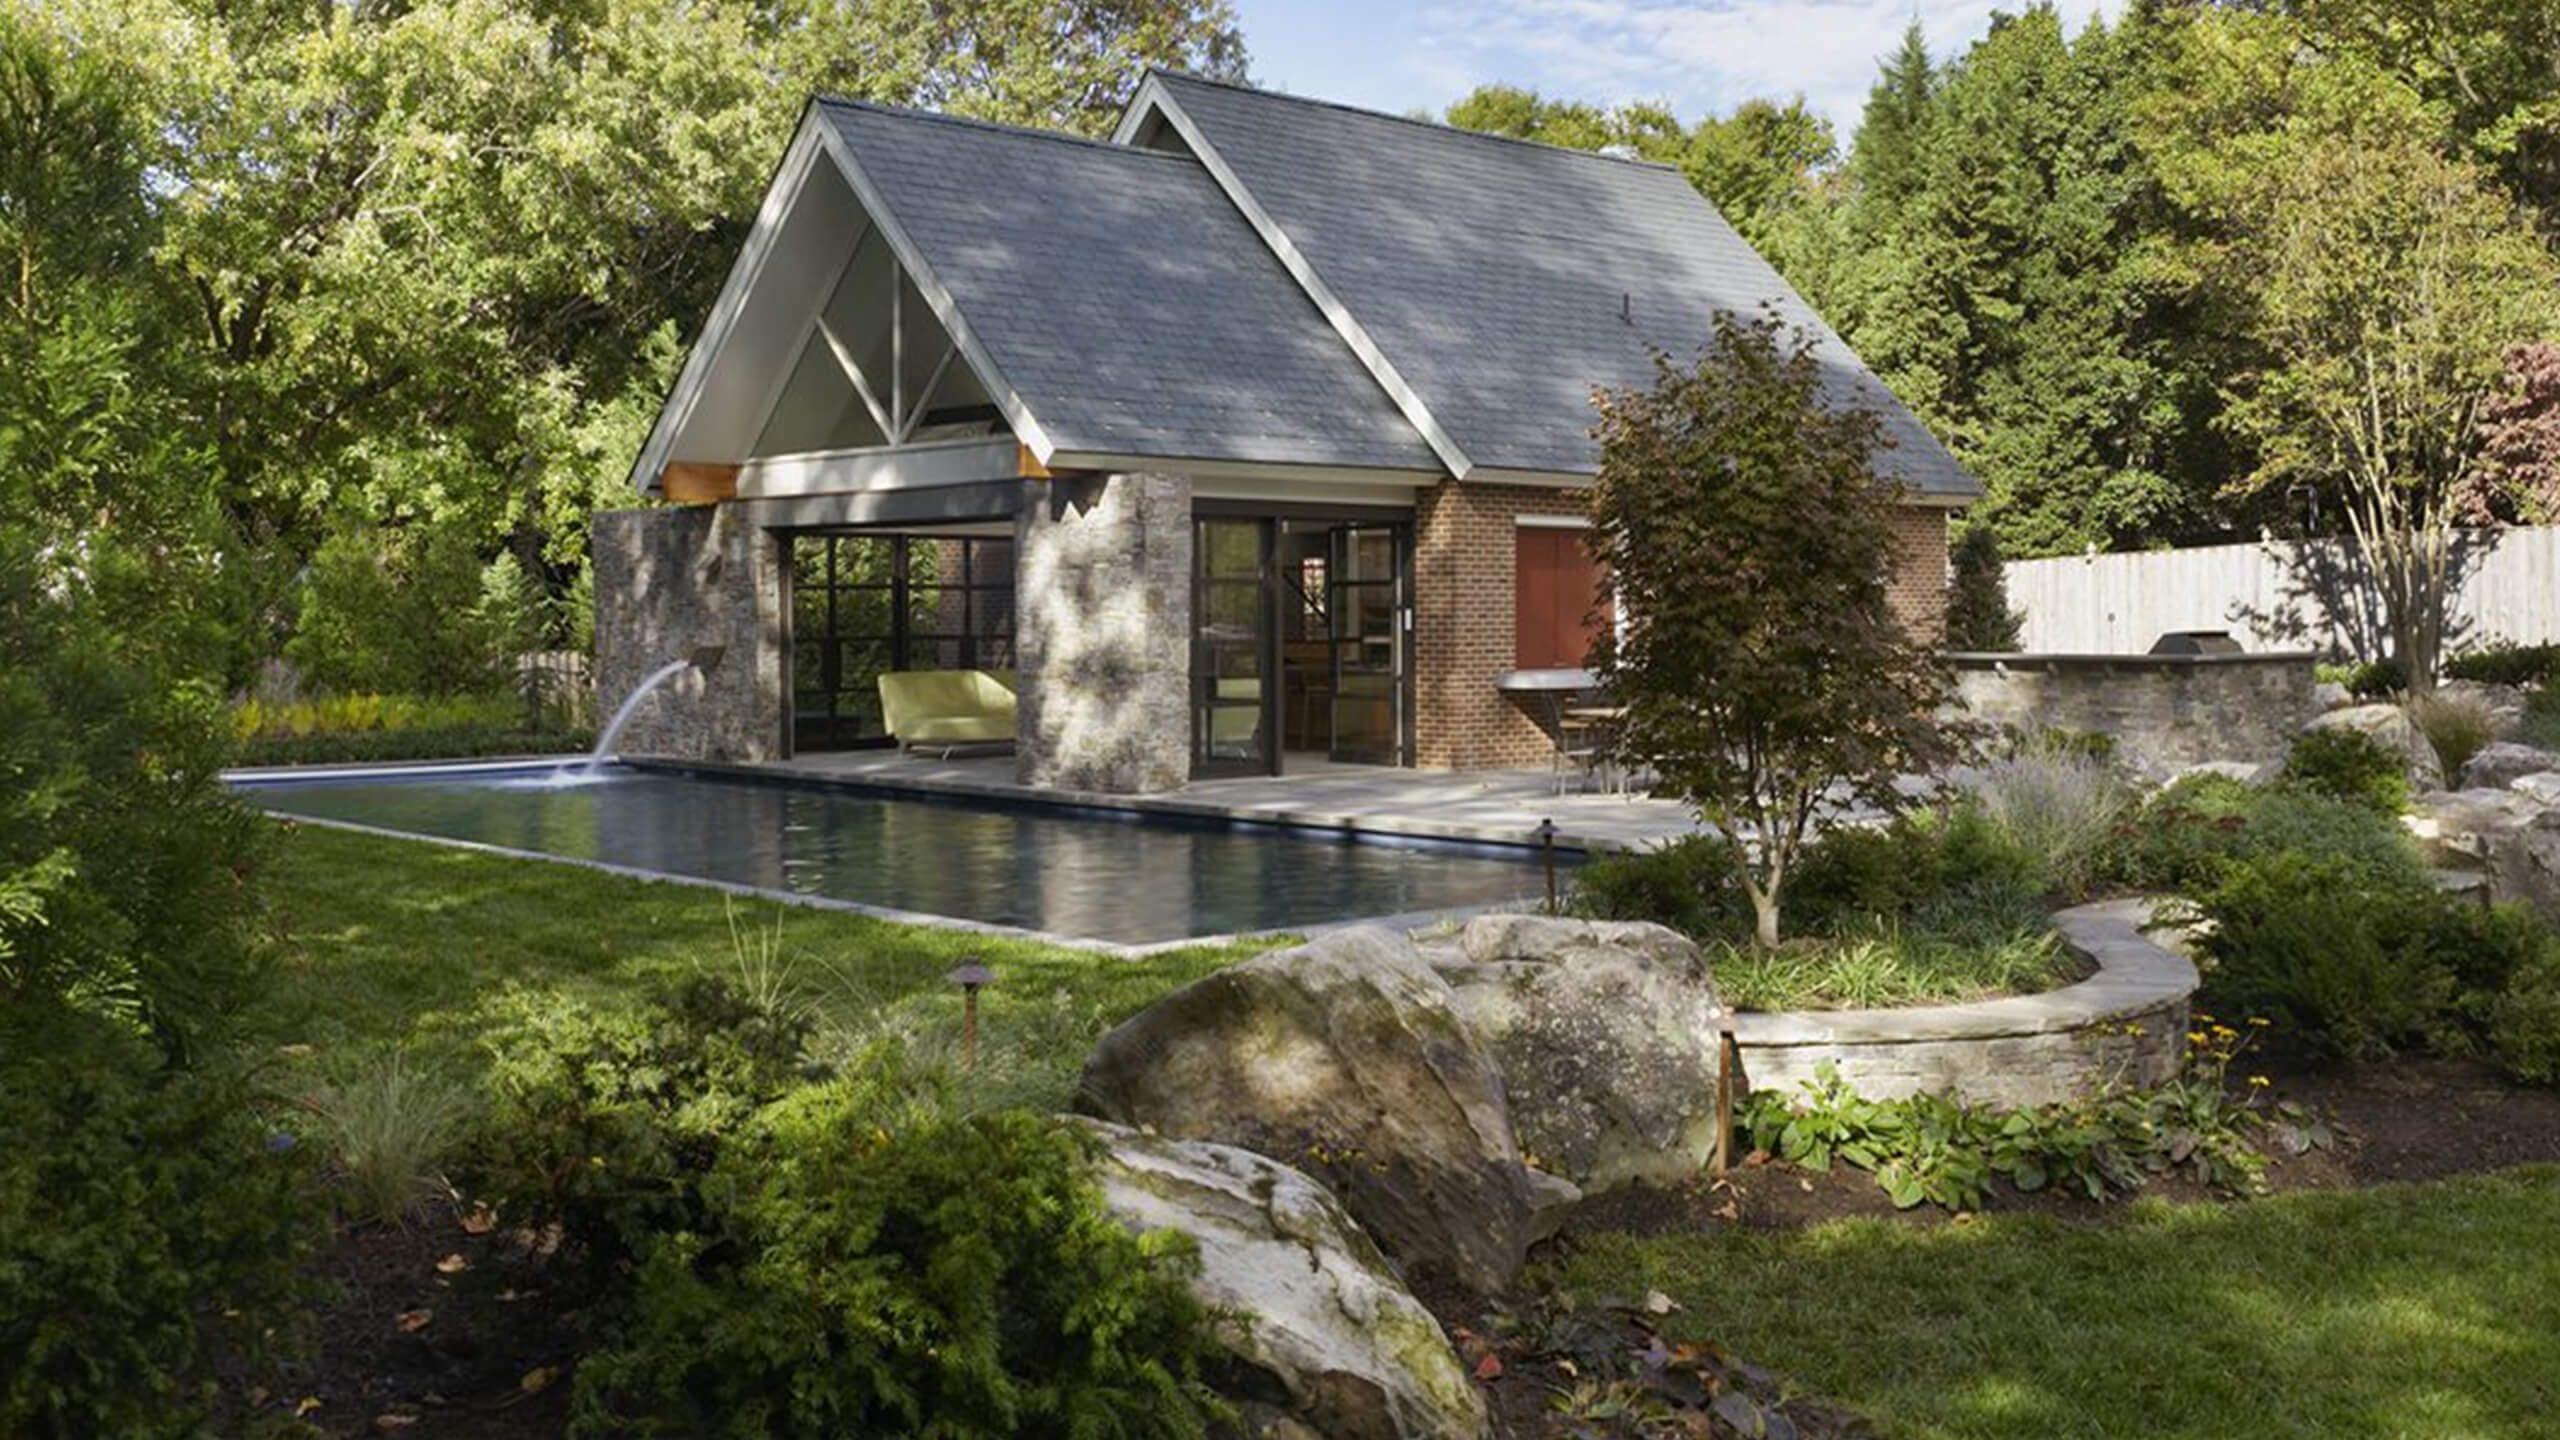 Crittall Peardon Pool House – Vapeardon Pool House – Va Image